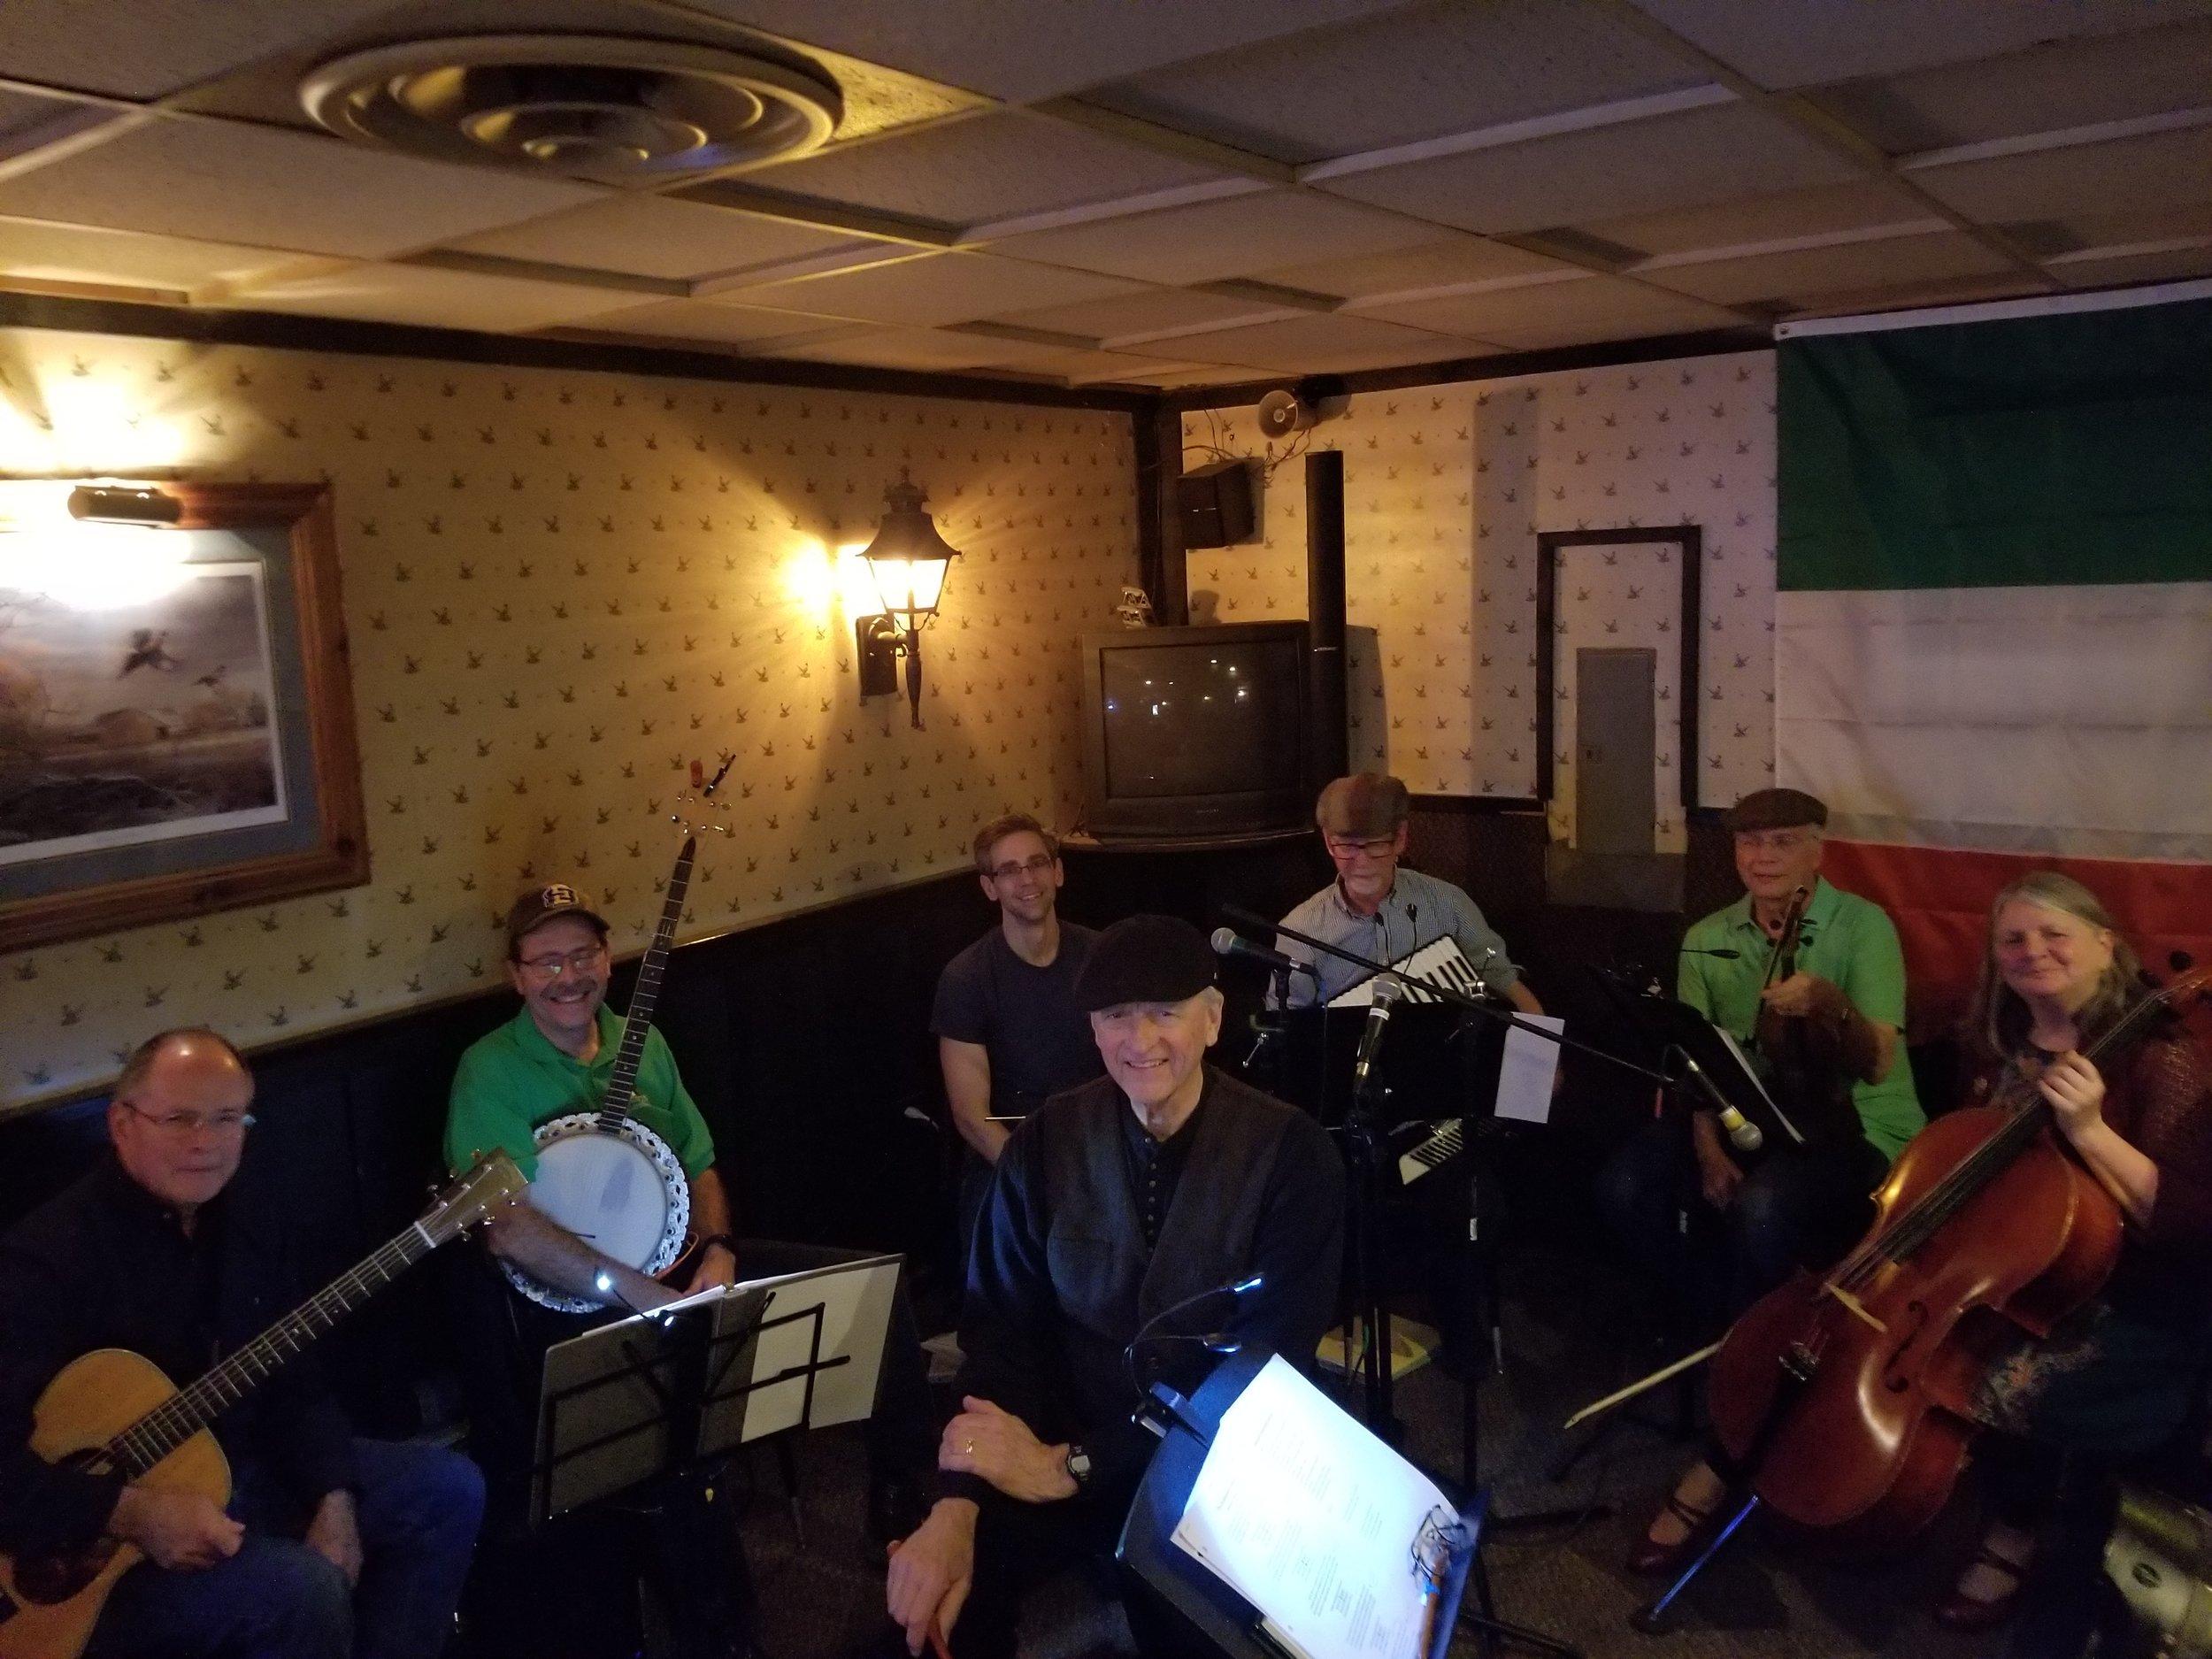 My dad's Irish Band's first concert